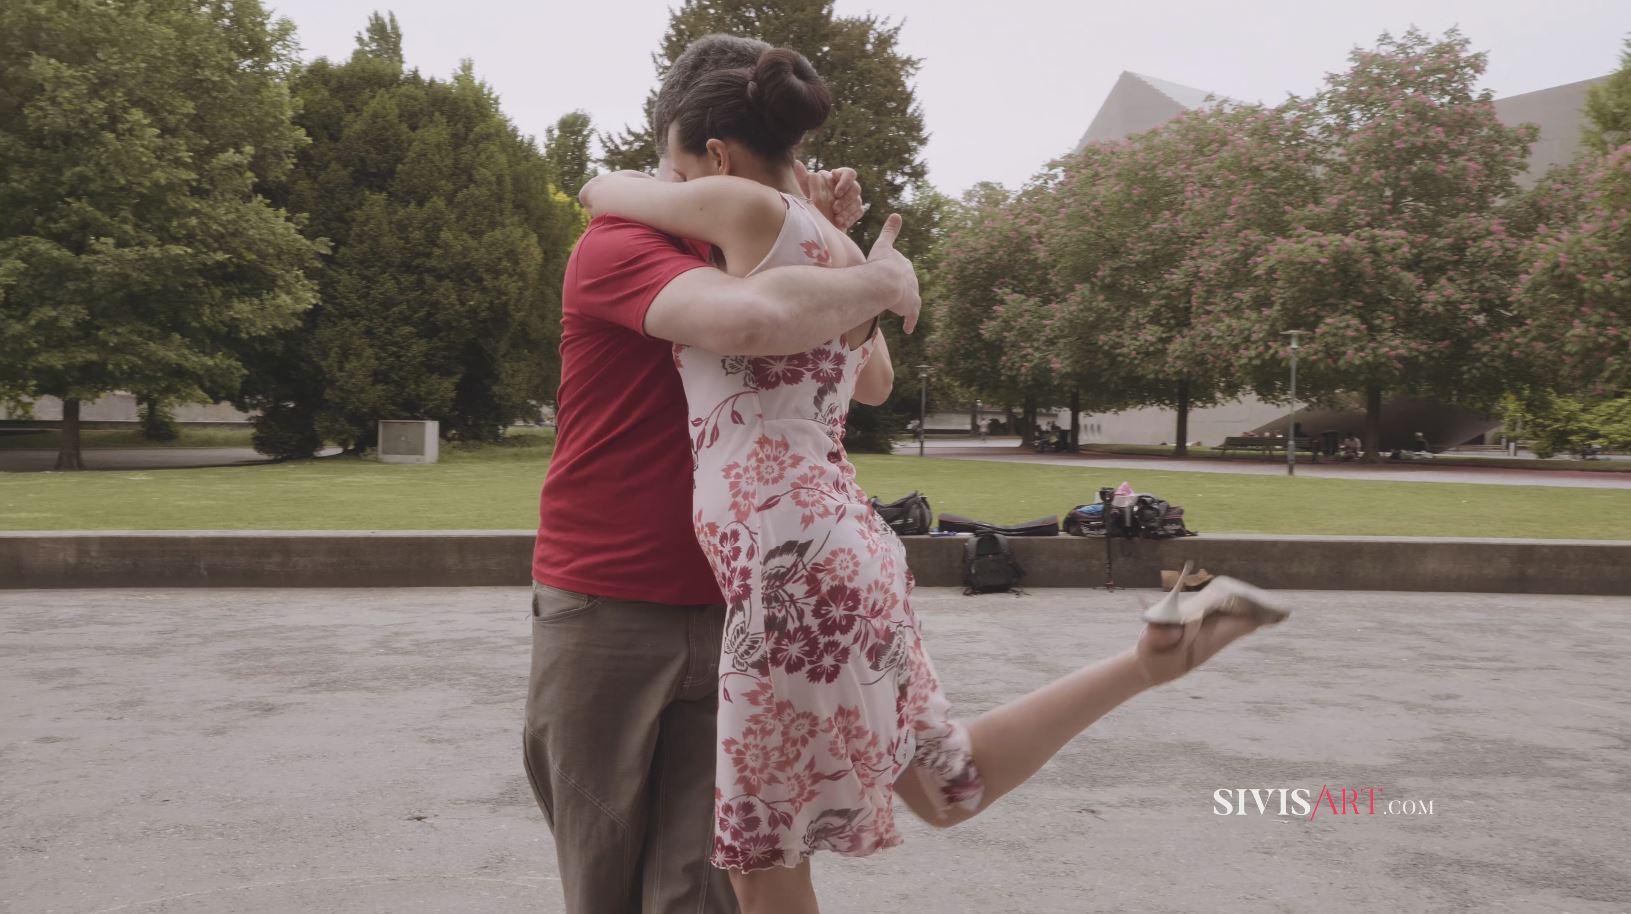 Sivis'art Videomaker presents Tango clandestino